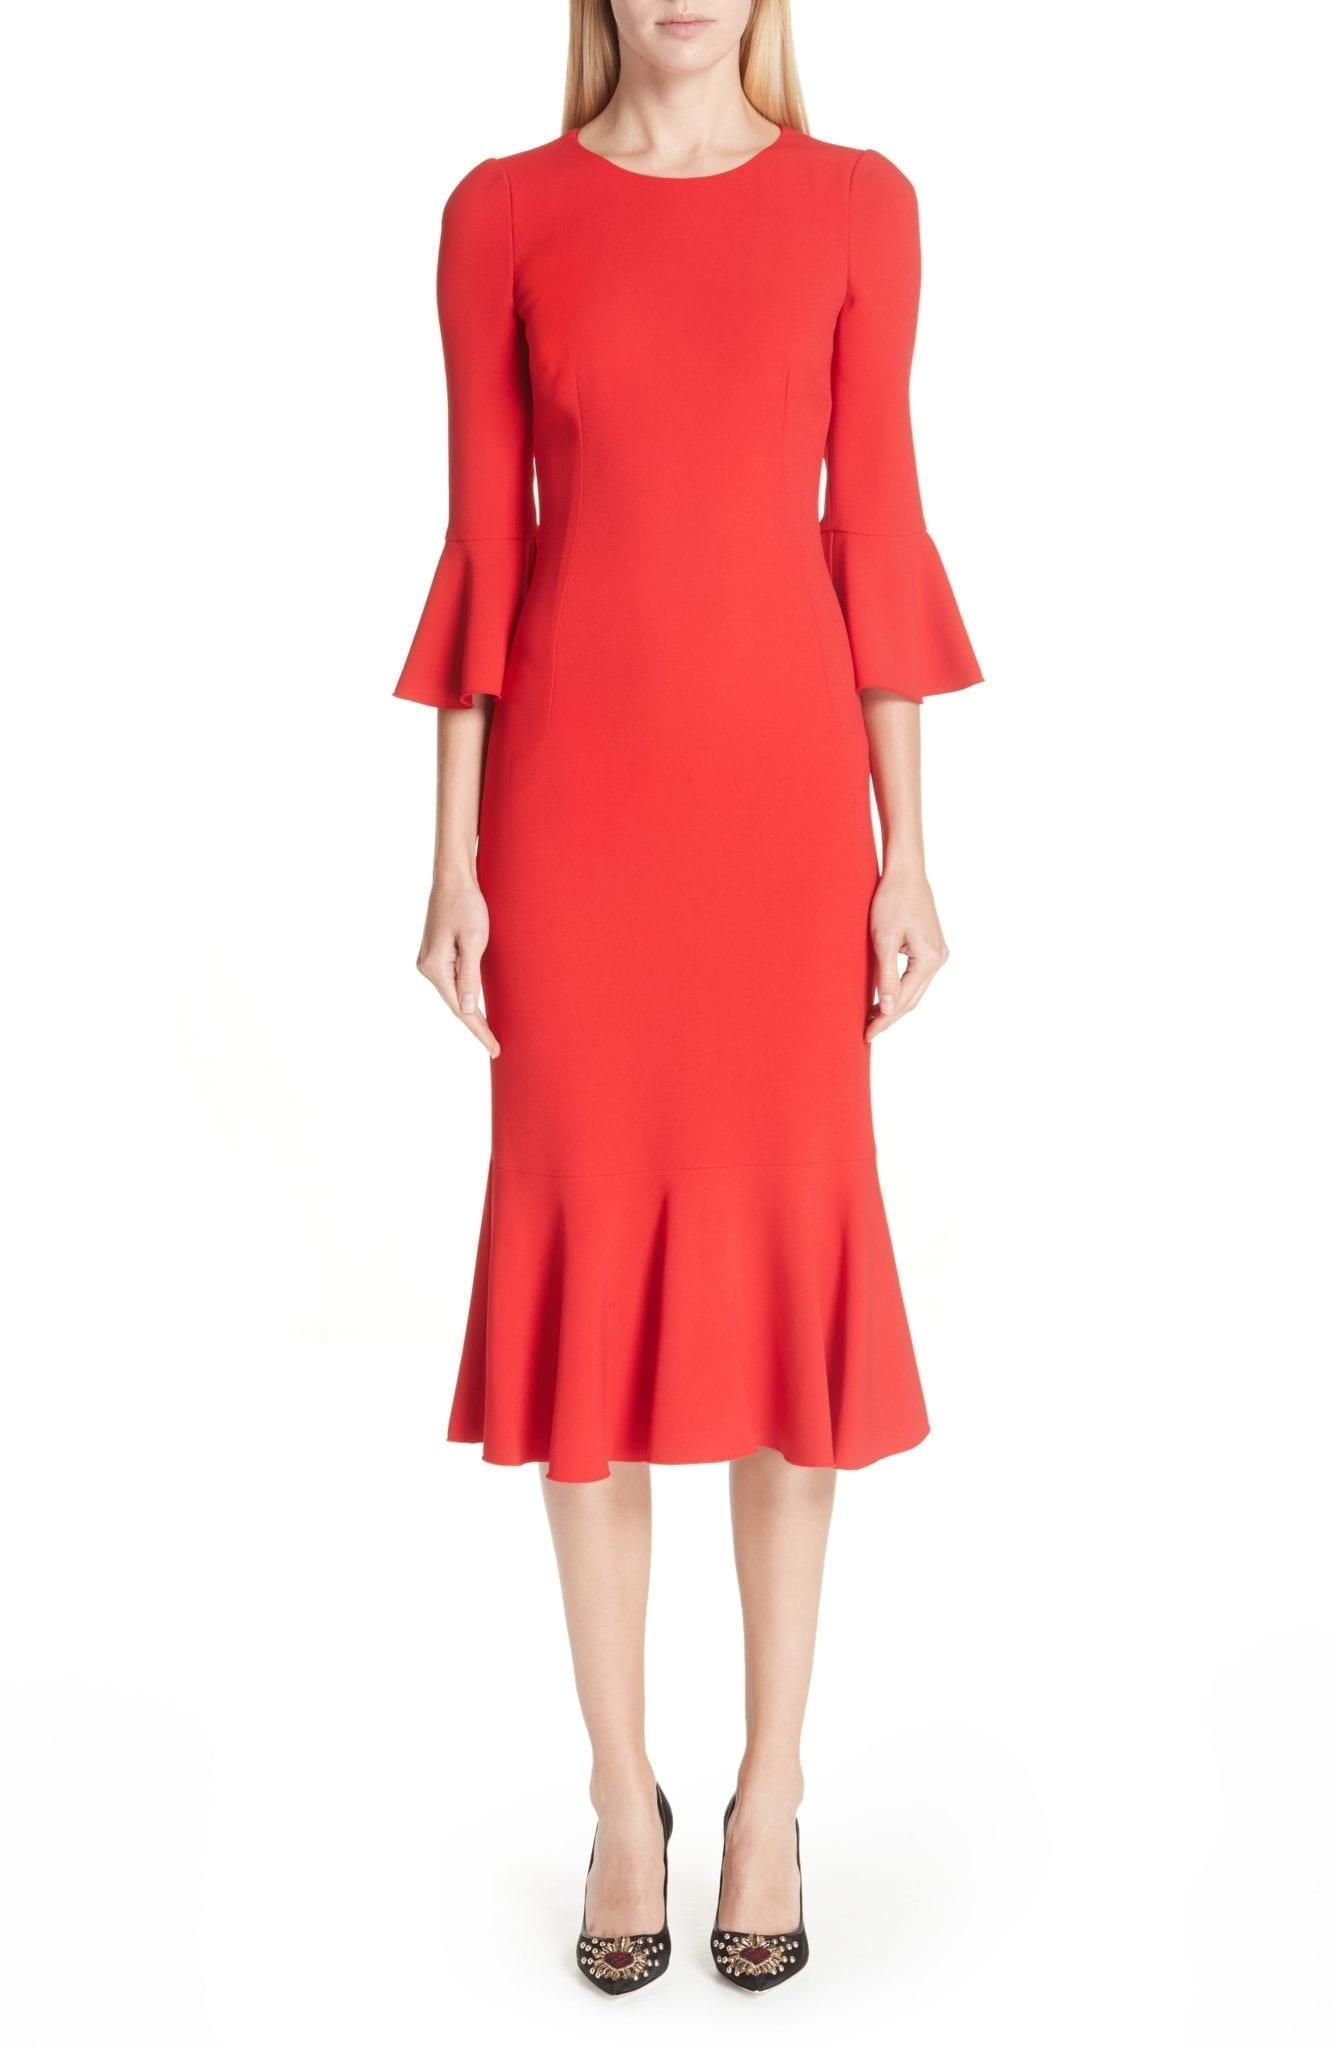 DOLCE&GABBANA Ruffle Hem Red Dress